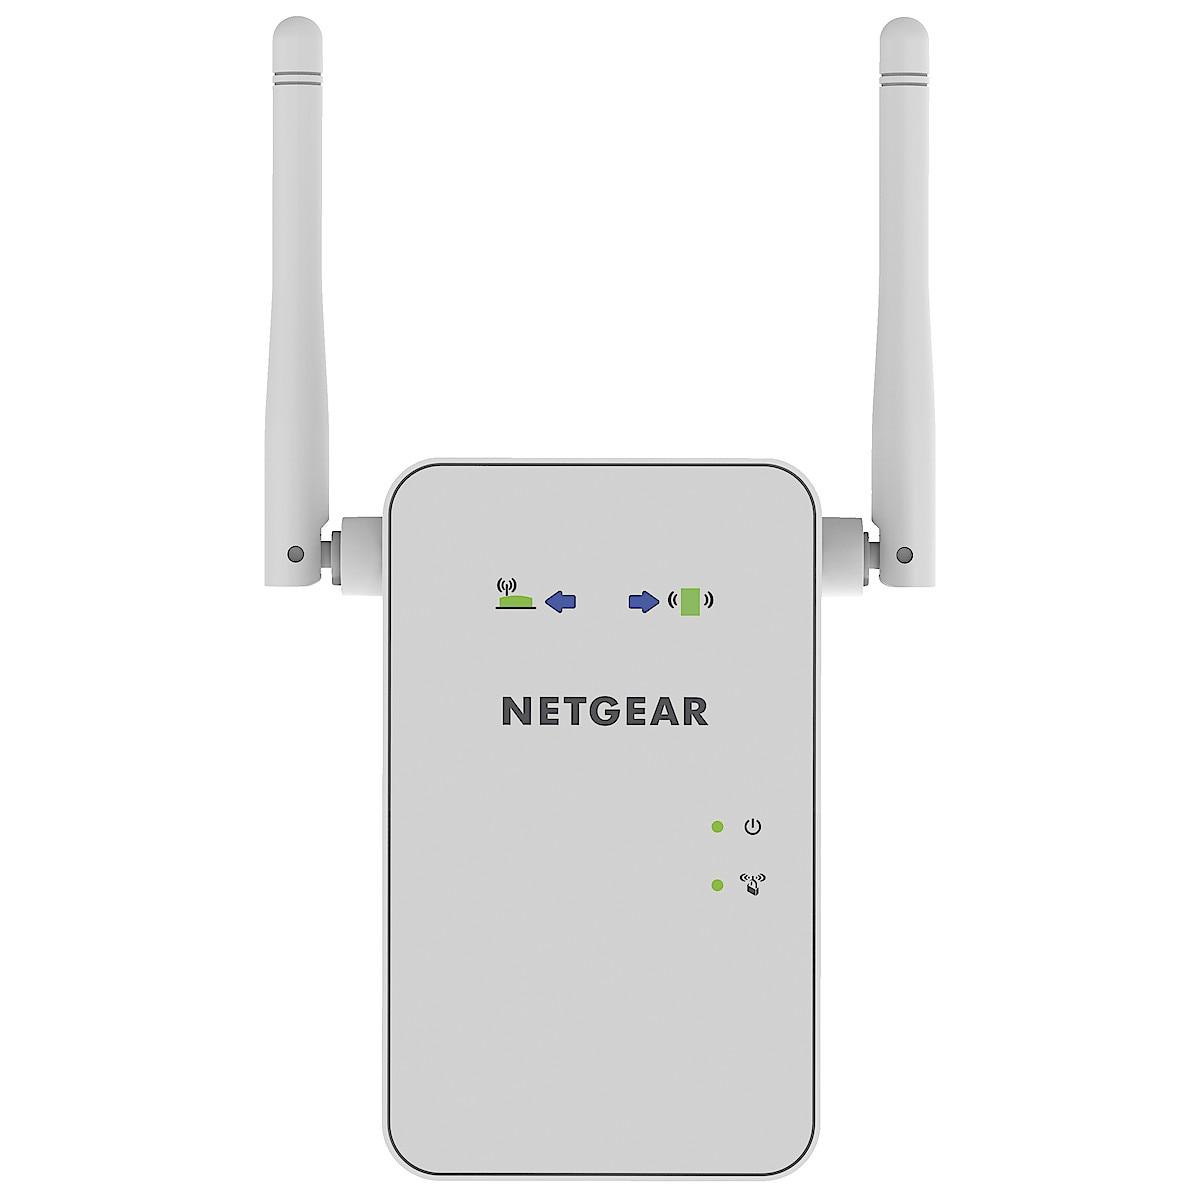 WiFi-vahvistin Netgear EX6100